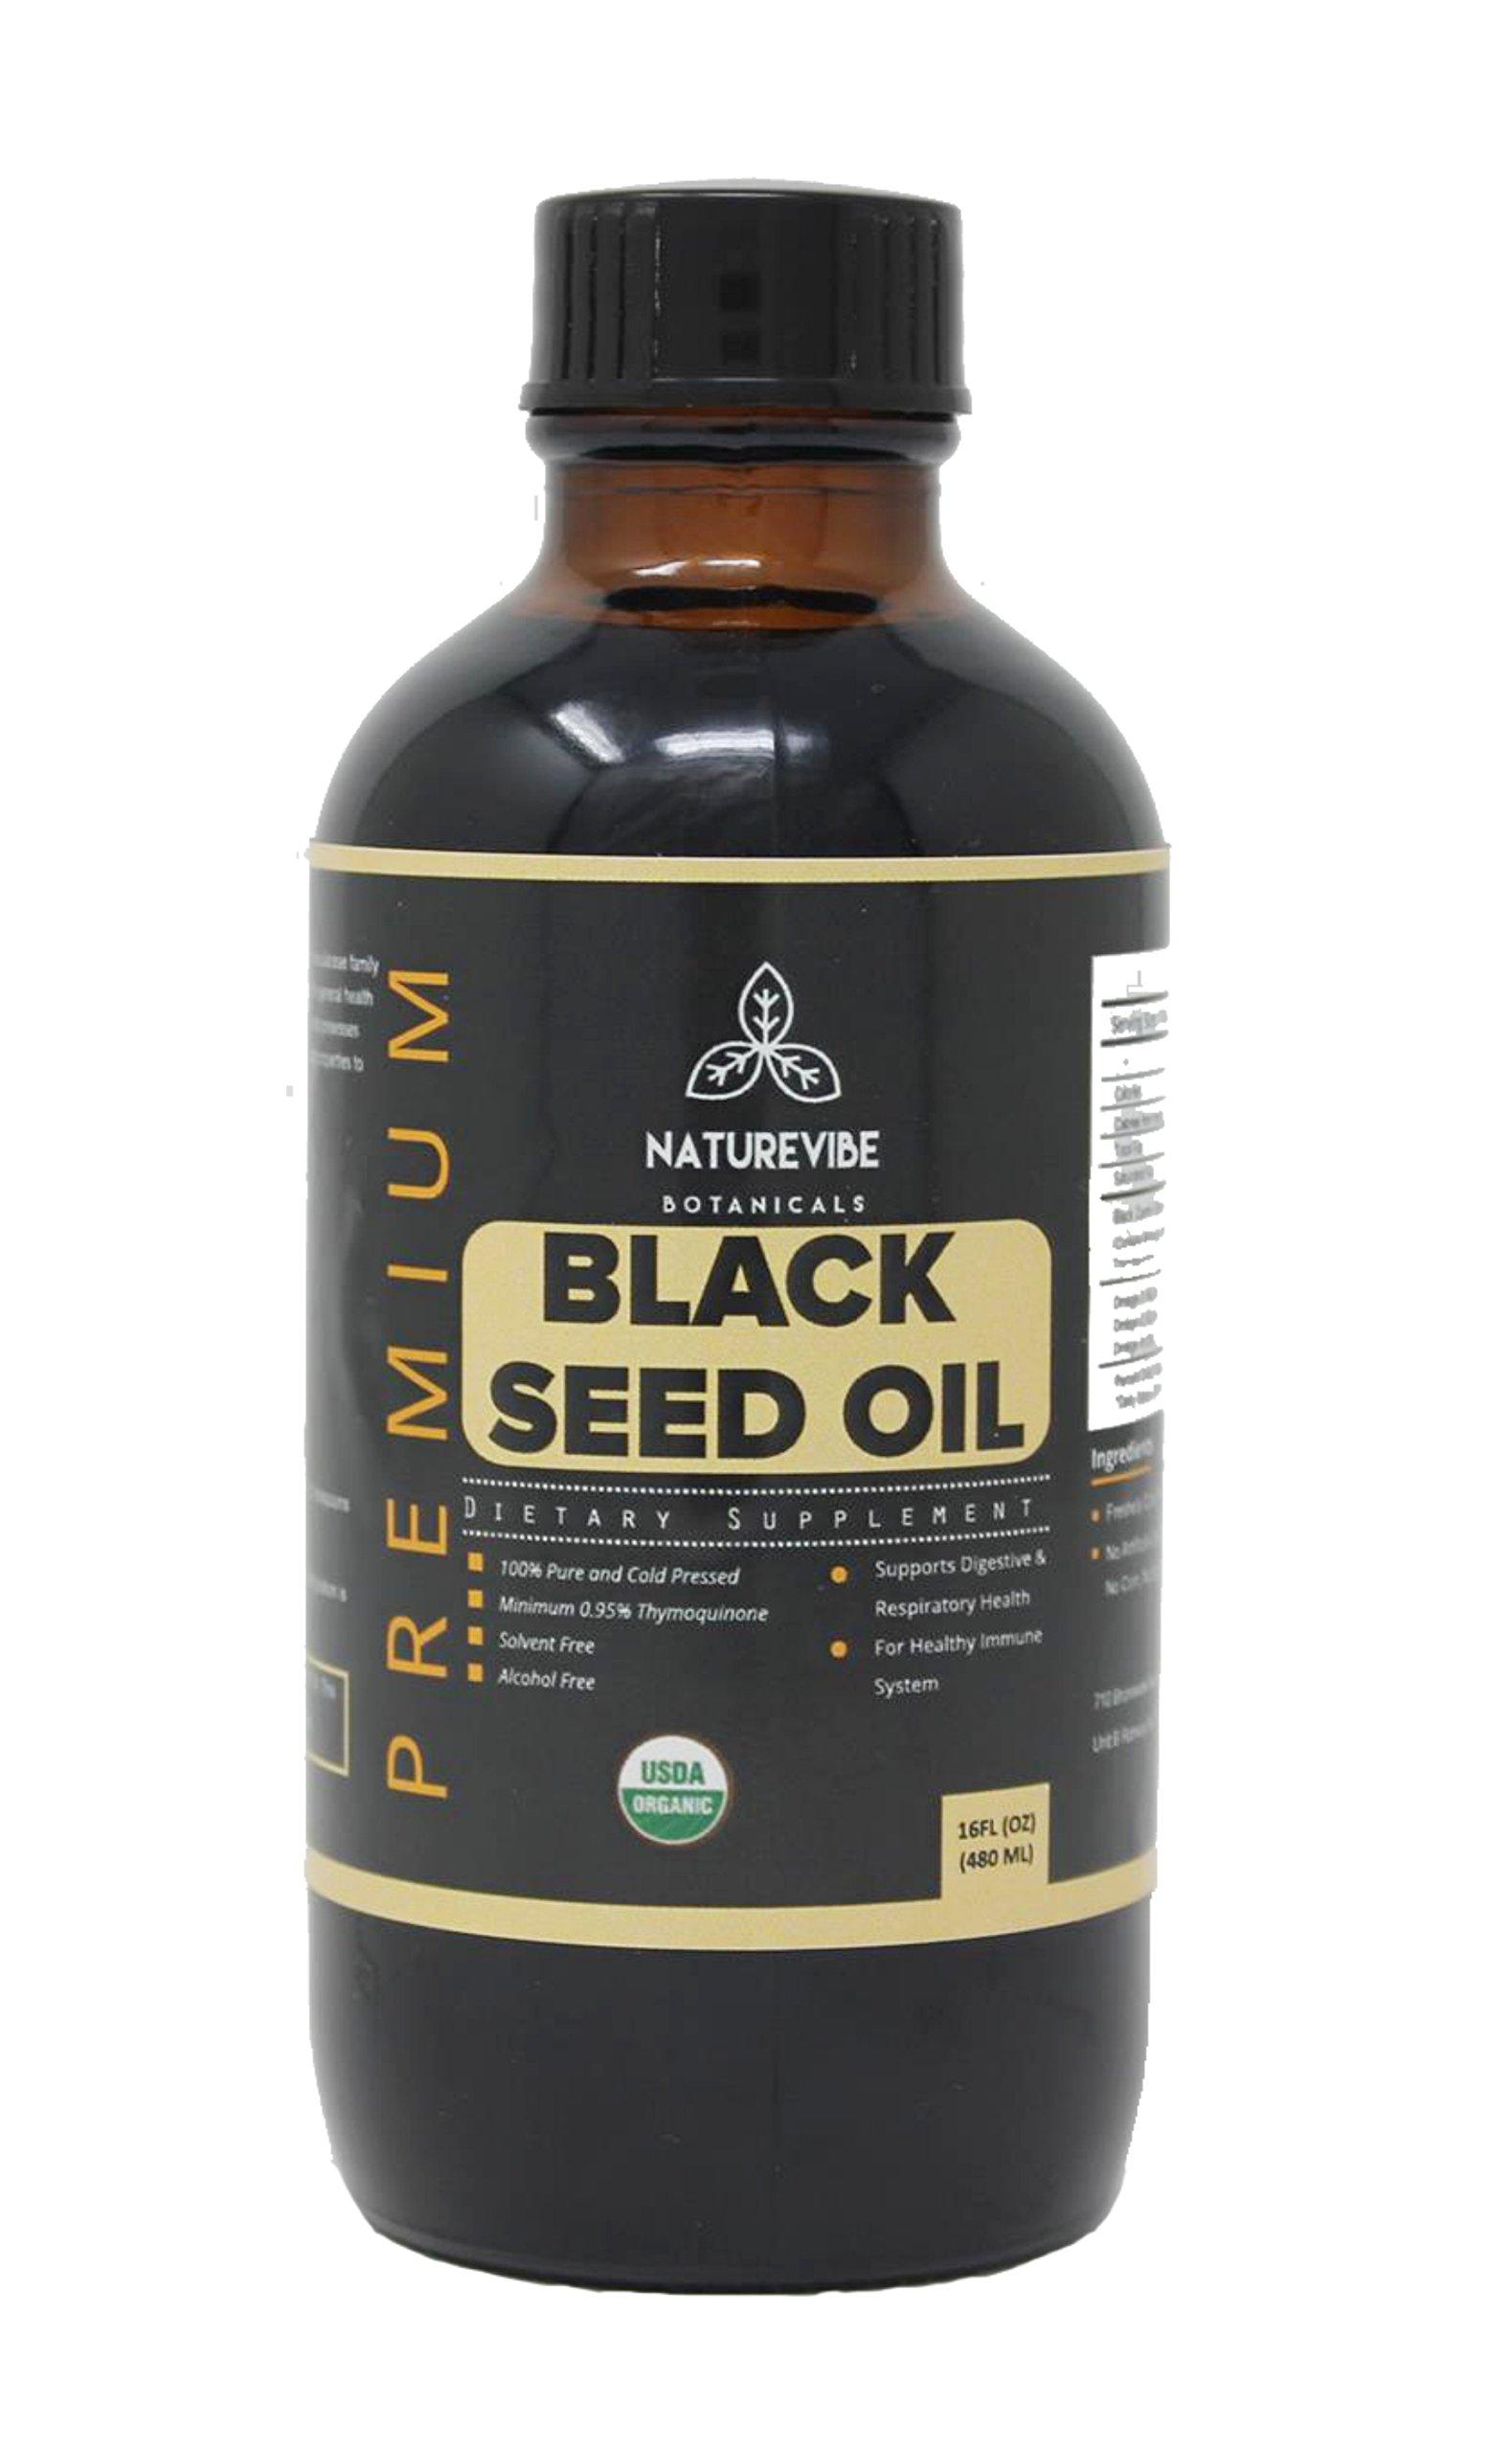 Naturevibe Botanicals Premium Organic Black Seed Oil (16 Ounce) | Cold Pressed Nigella Sativa, Thymoquinone | Gluten-Free & Non-GMO...